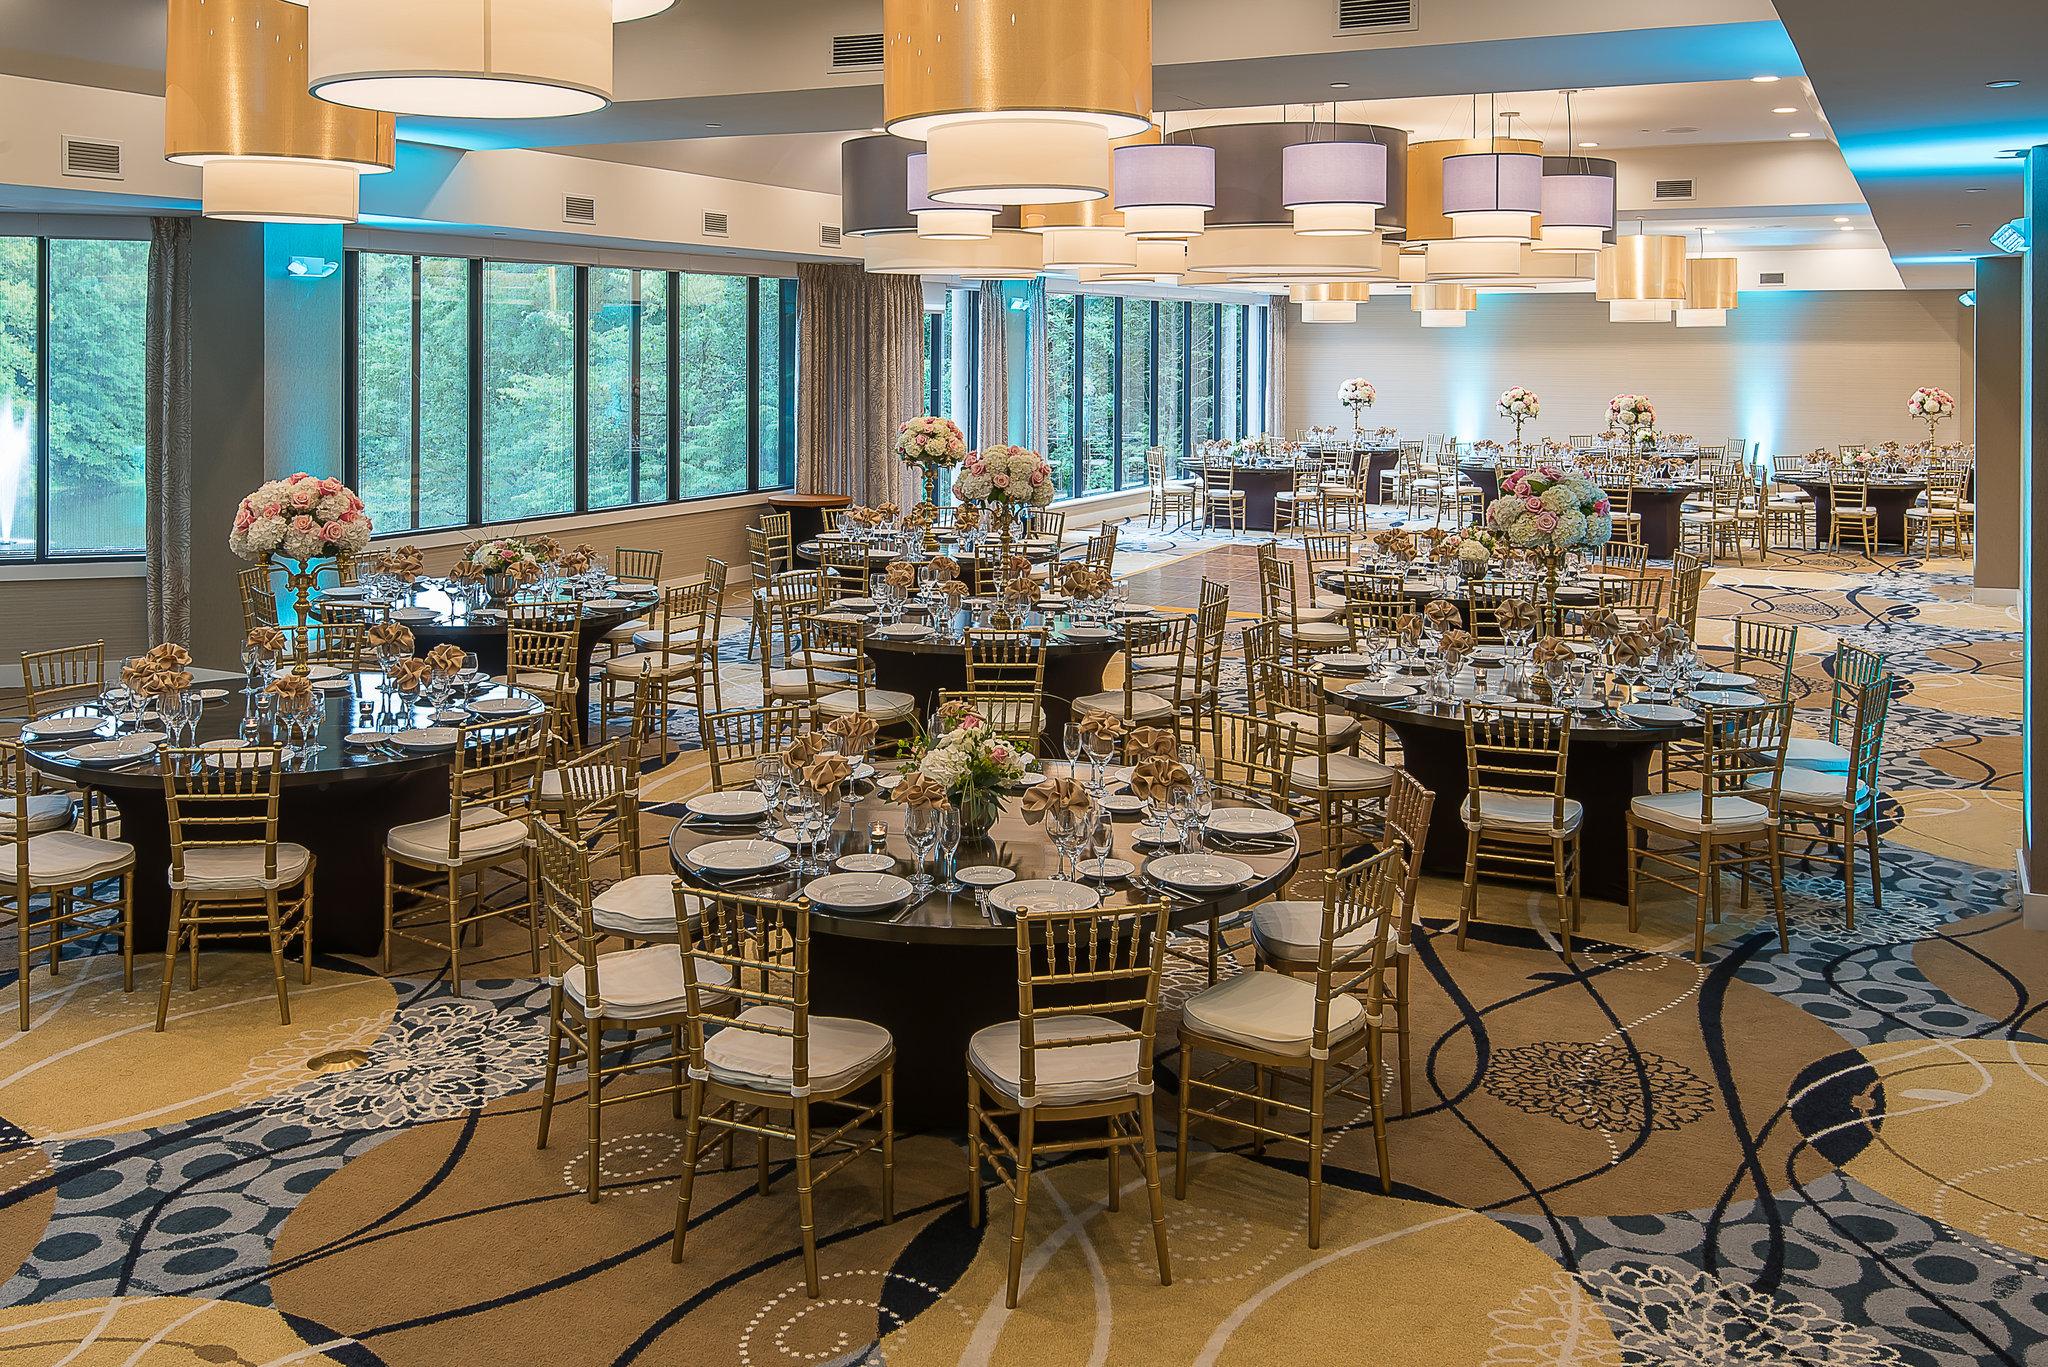 Hotel in Plainsboro NJ | Crowne Plaza Princeton Conference